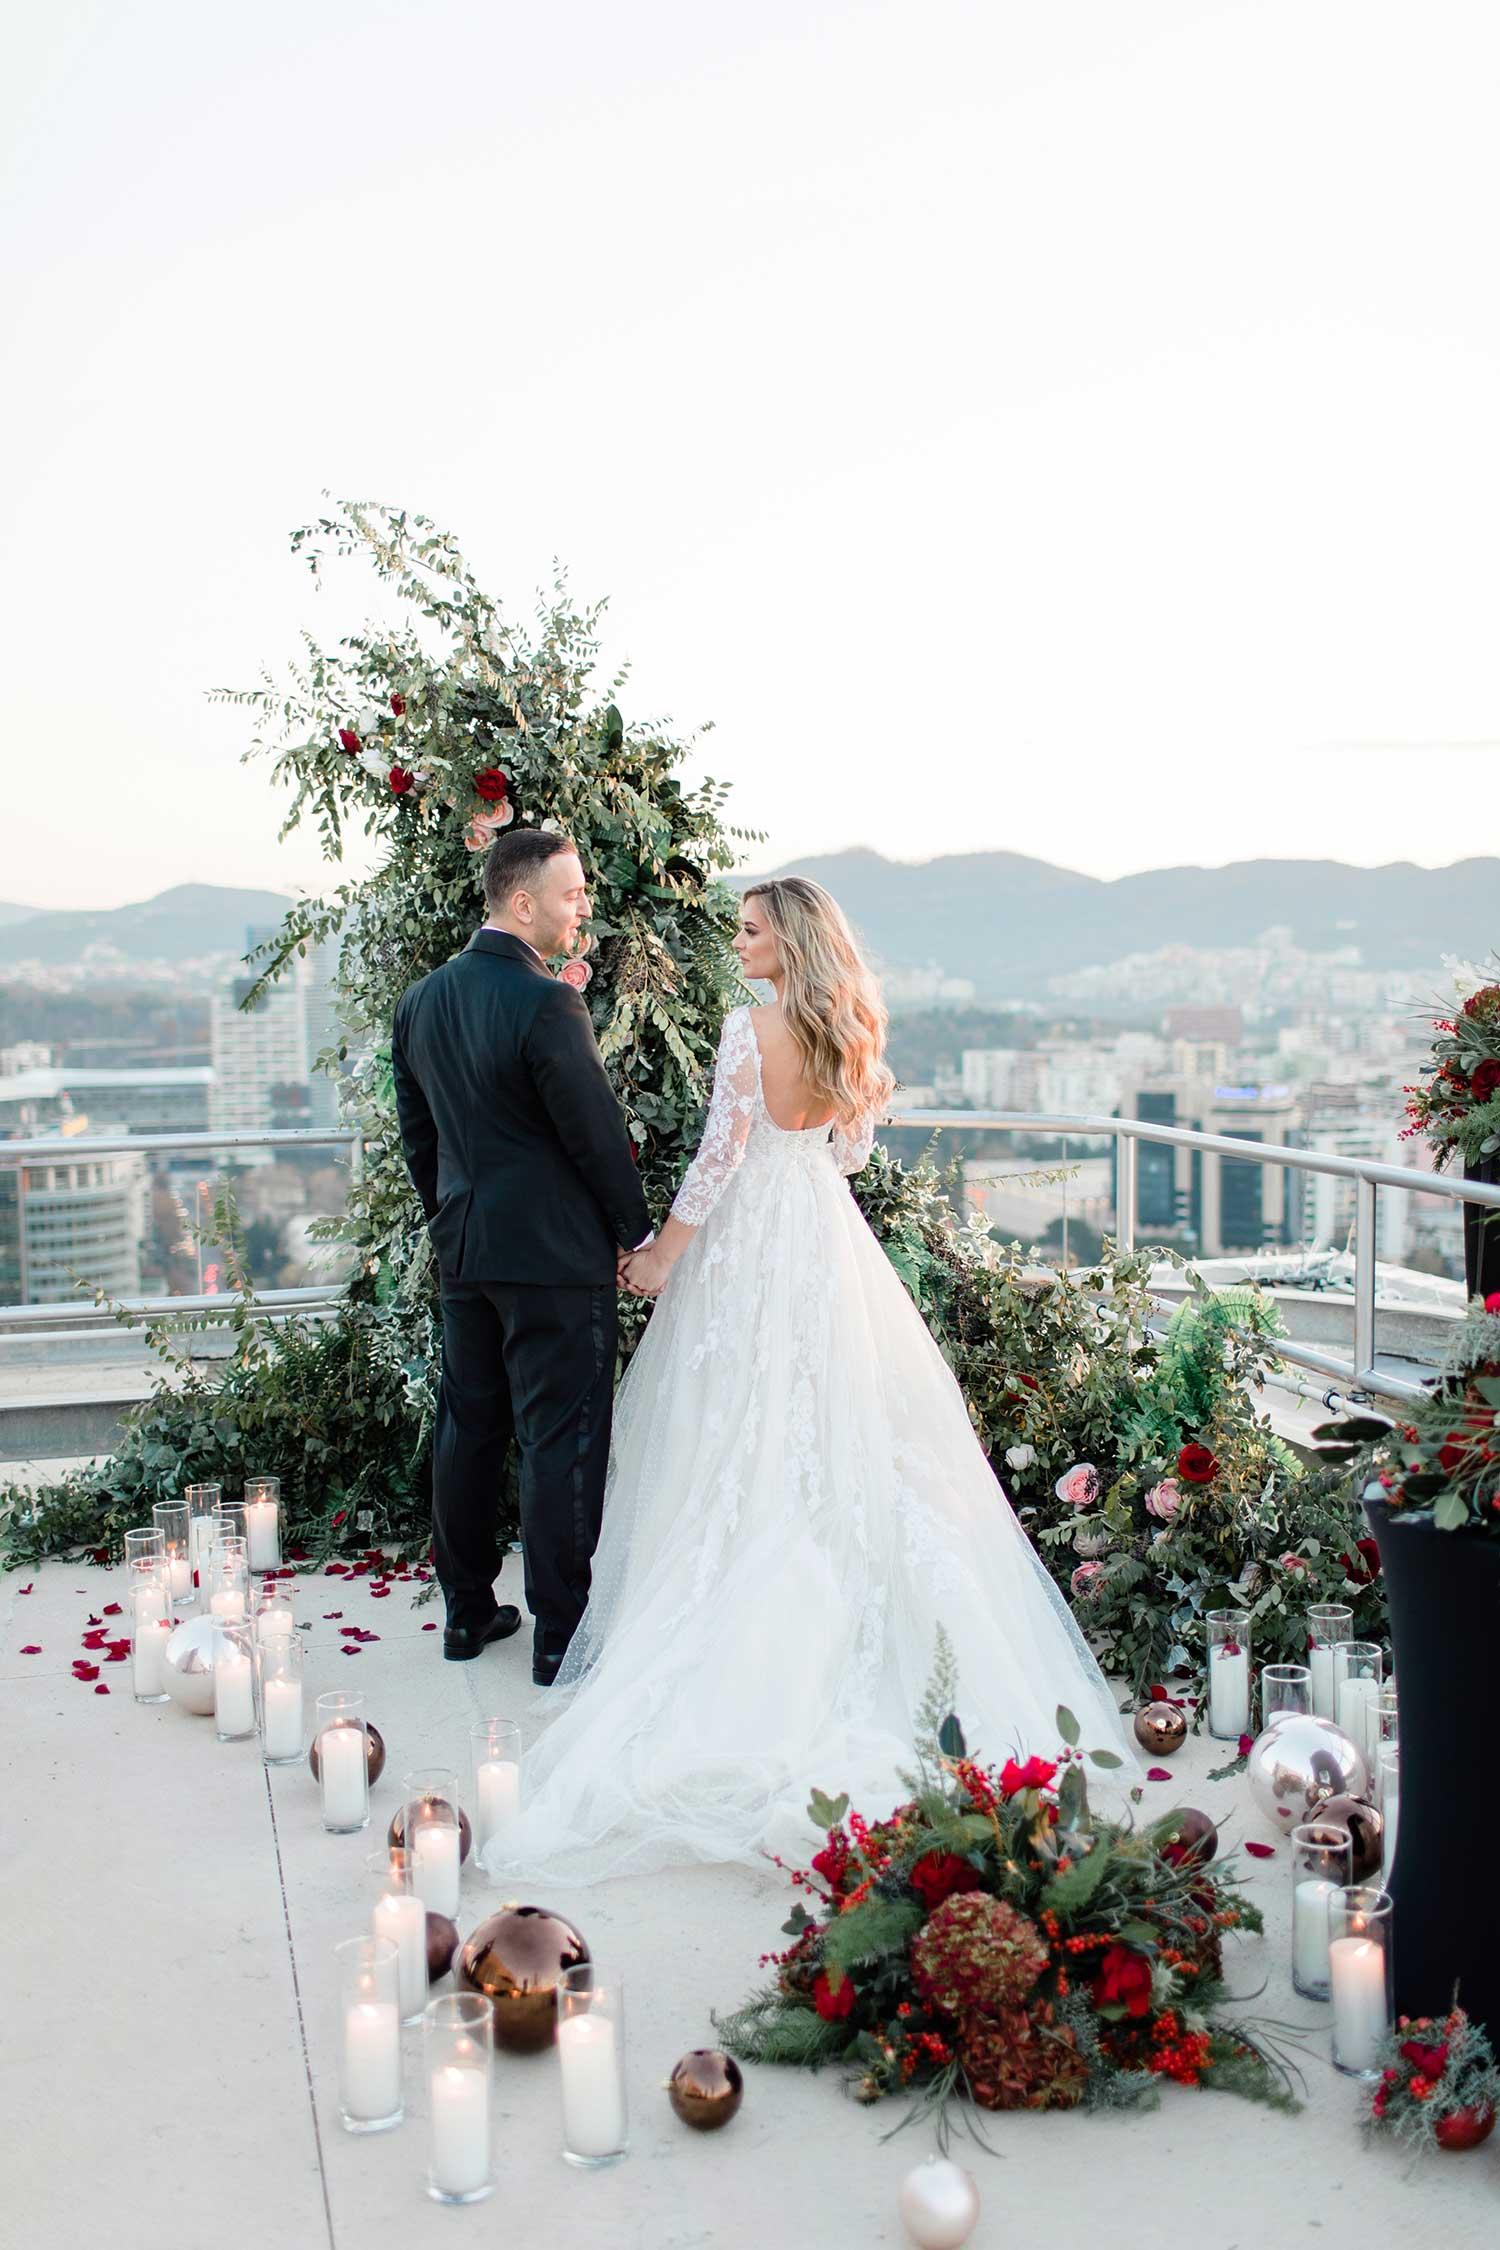 Couple's photoshoot on the terrace